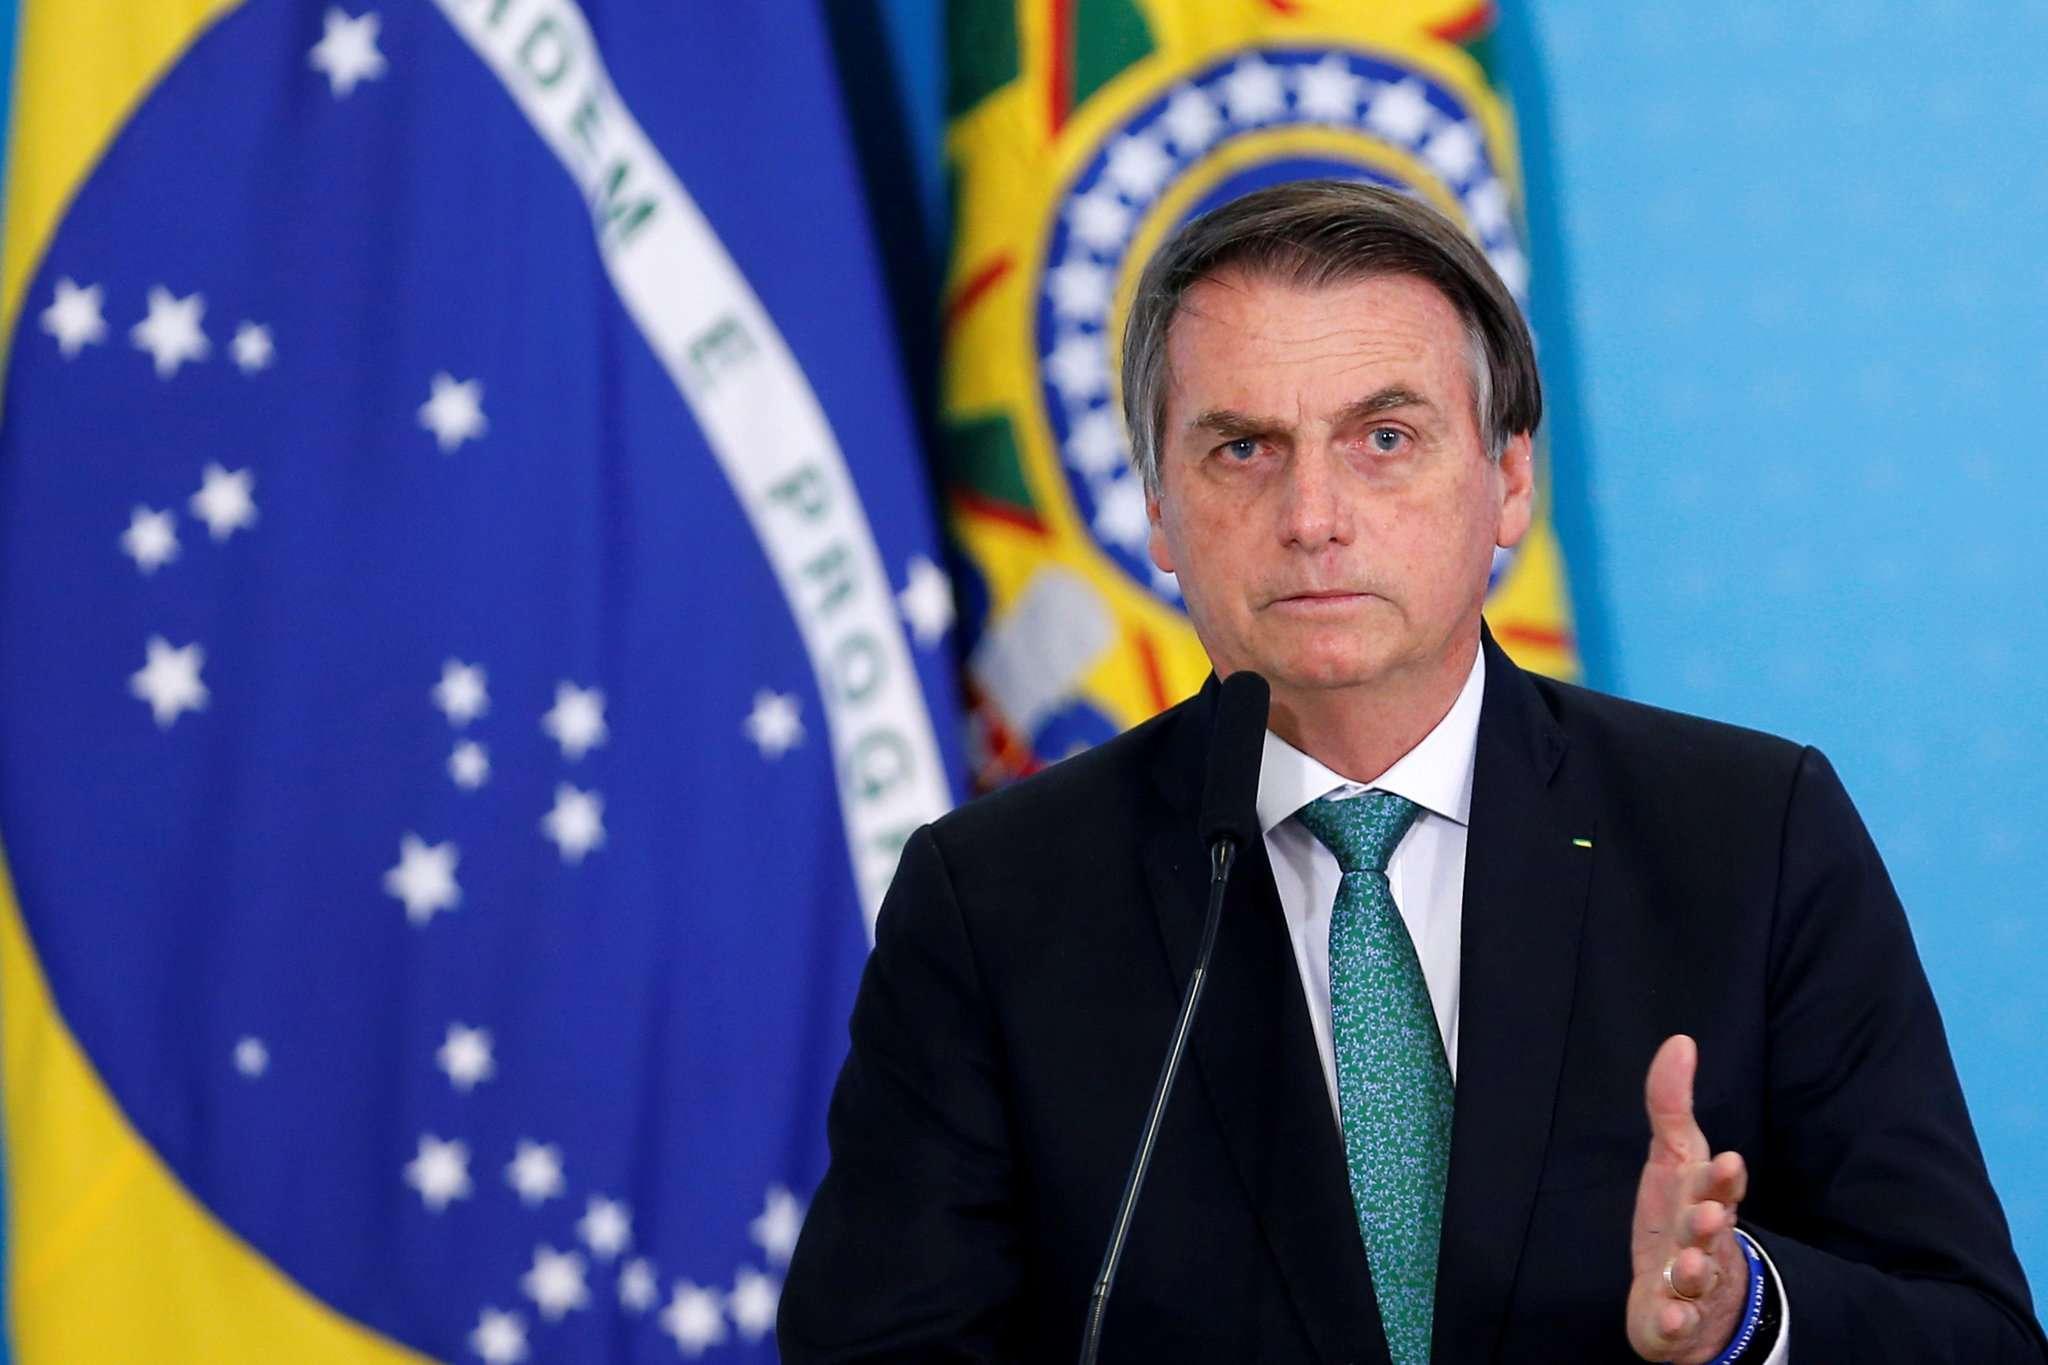 Jair Bolsonaro, presidente de Brasil. / EFE